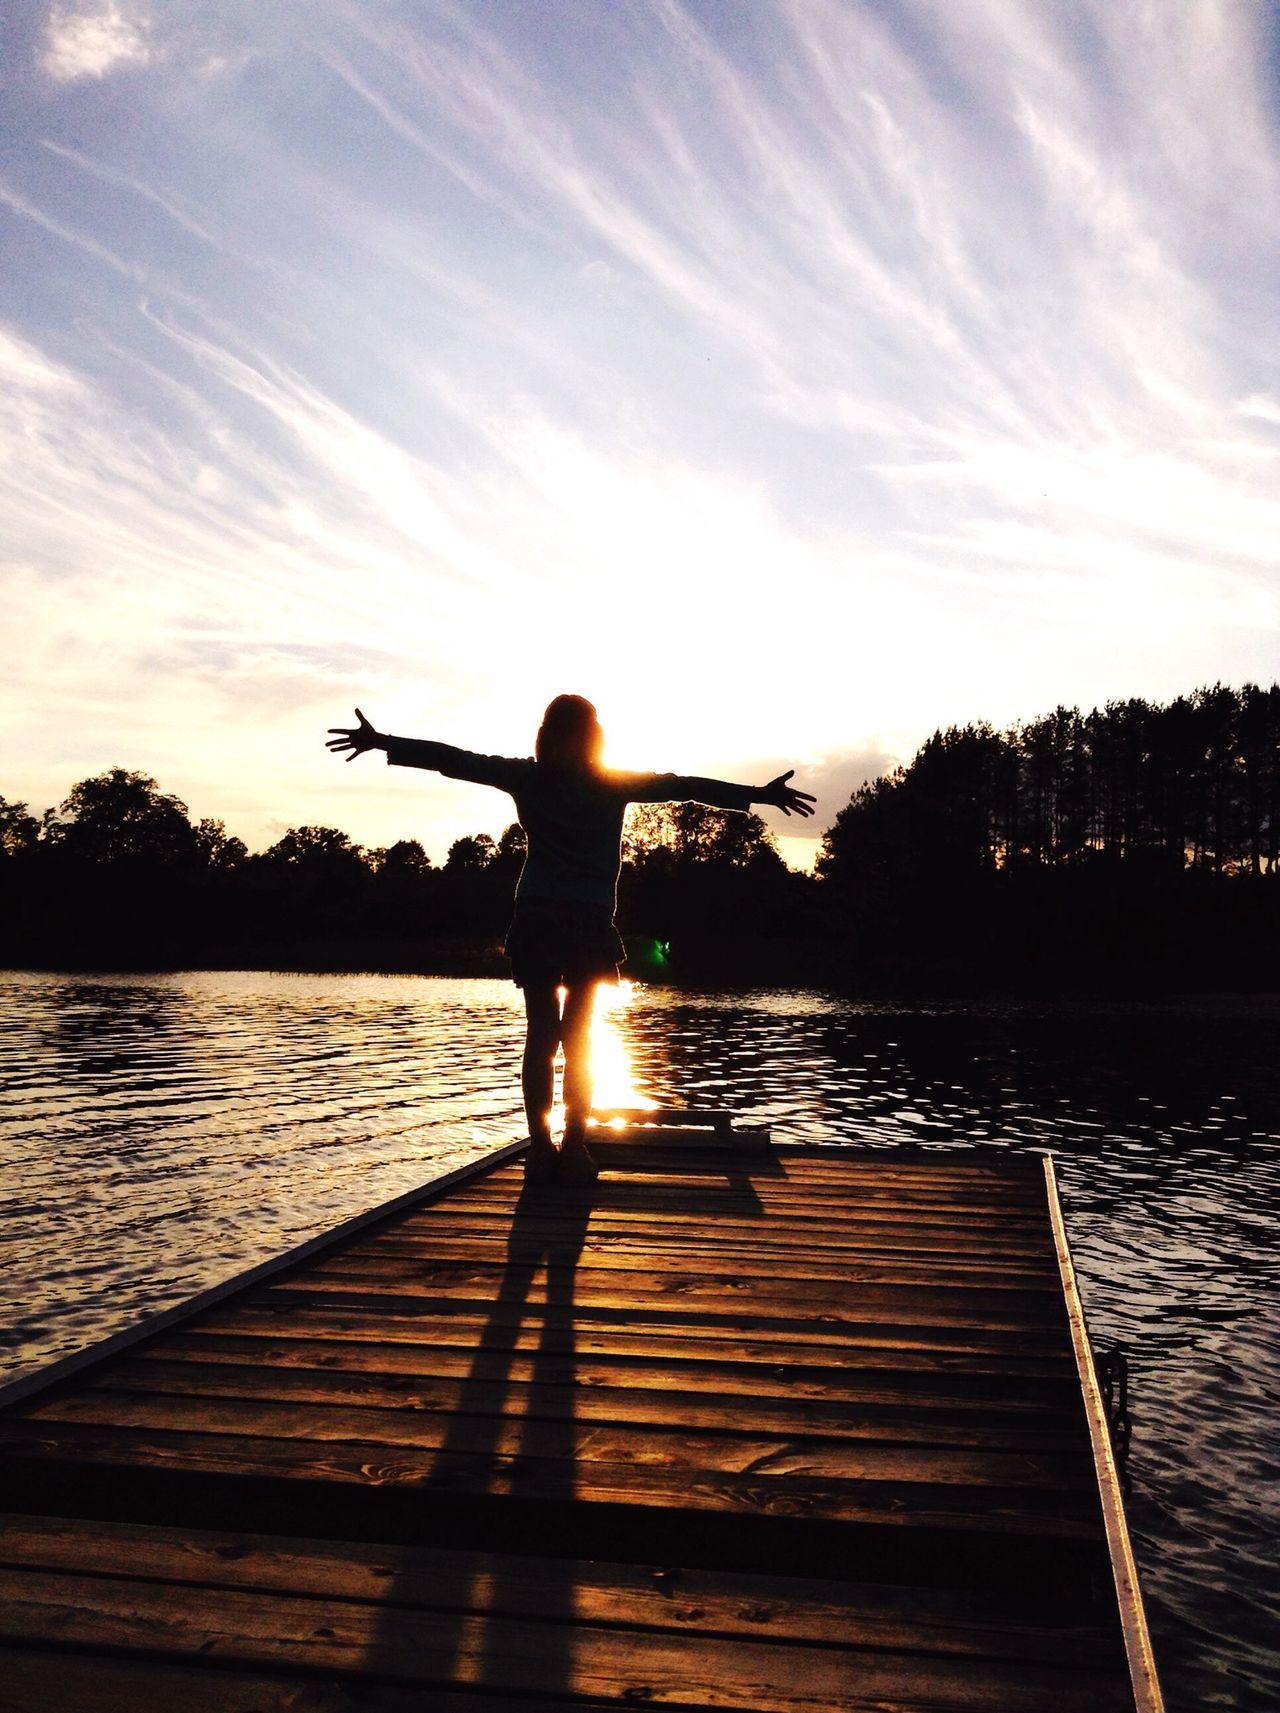 My little sister Love Sister ❤ Summer Evening Evening Sky Sky Collection Lake The Traveler - 2015 EyeEm Awards